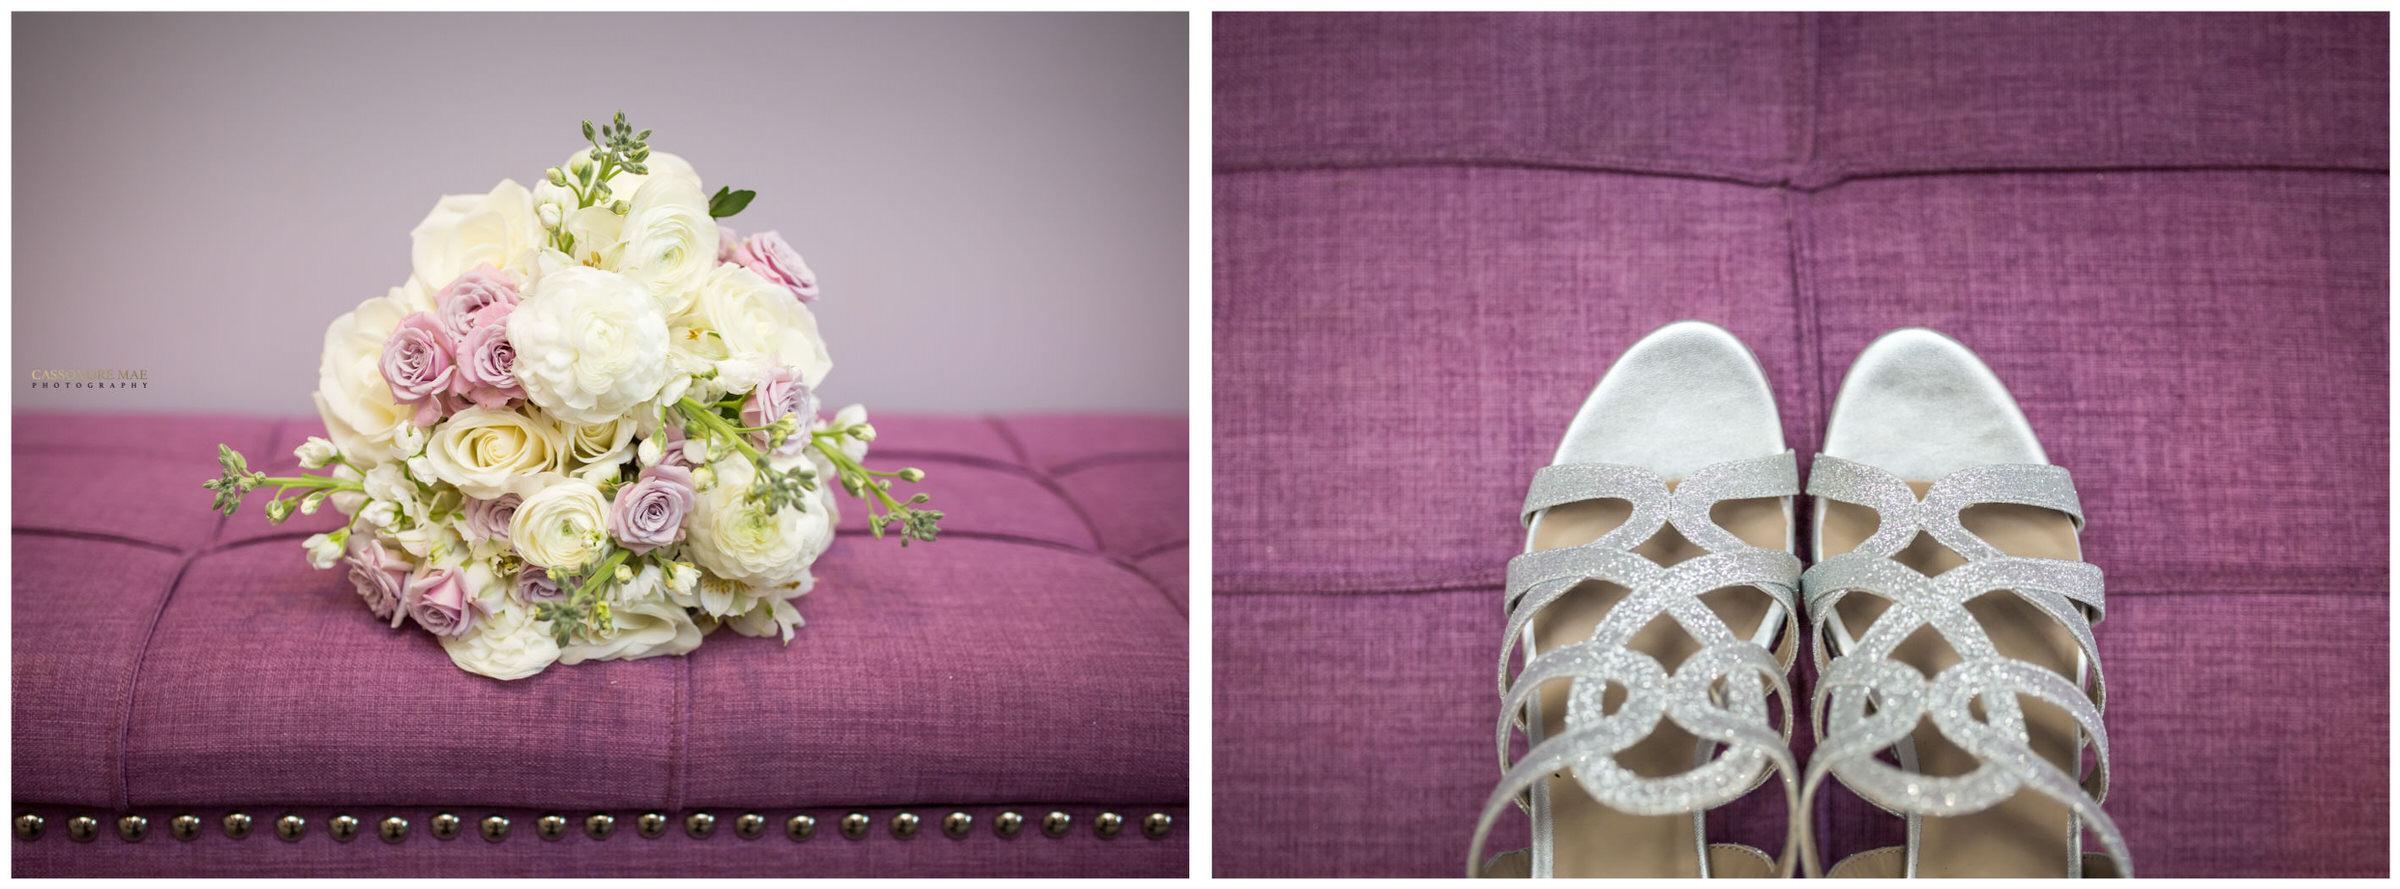 Cassondre Mae Photography Villa Venezia Wedding Photographer 2.jpg